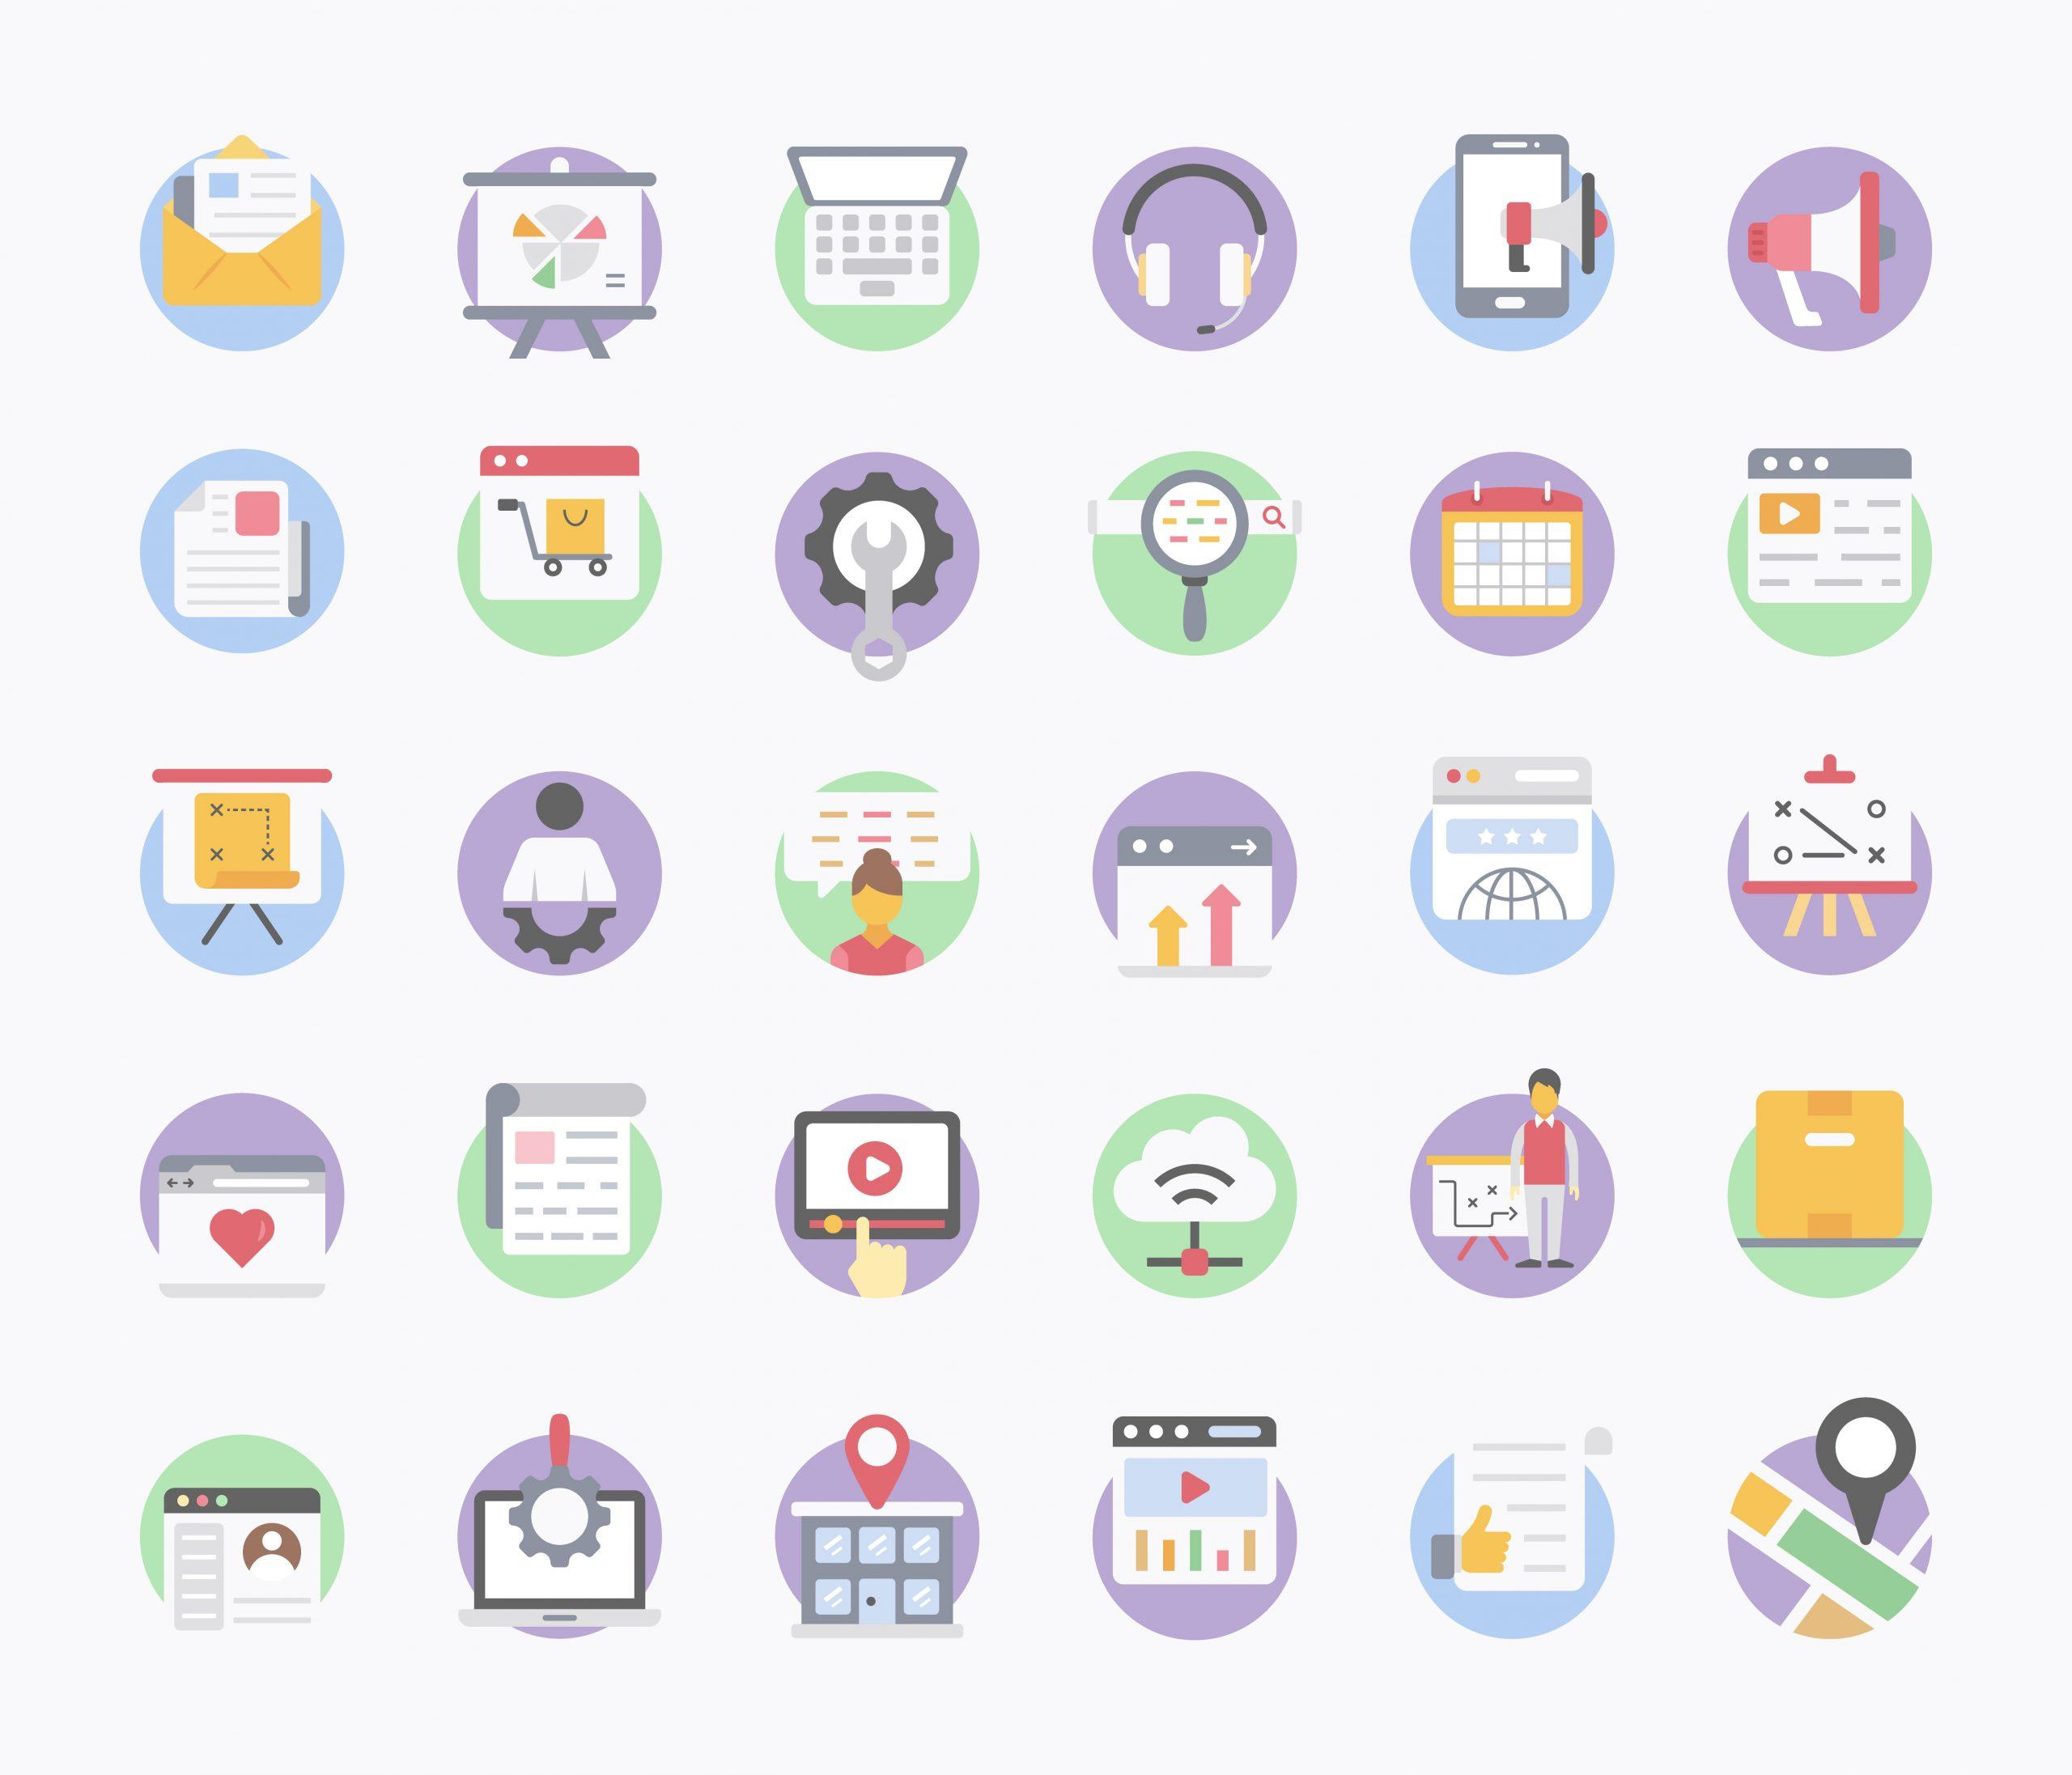 Digital Marketing Flat Icons